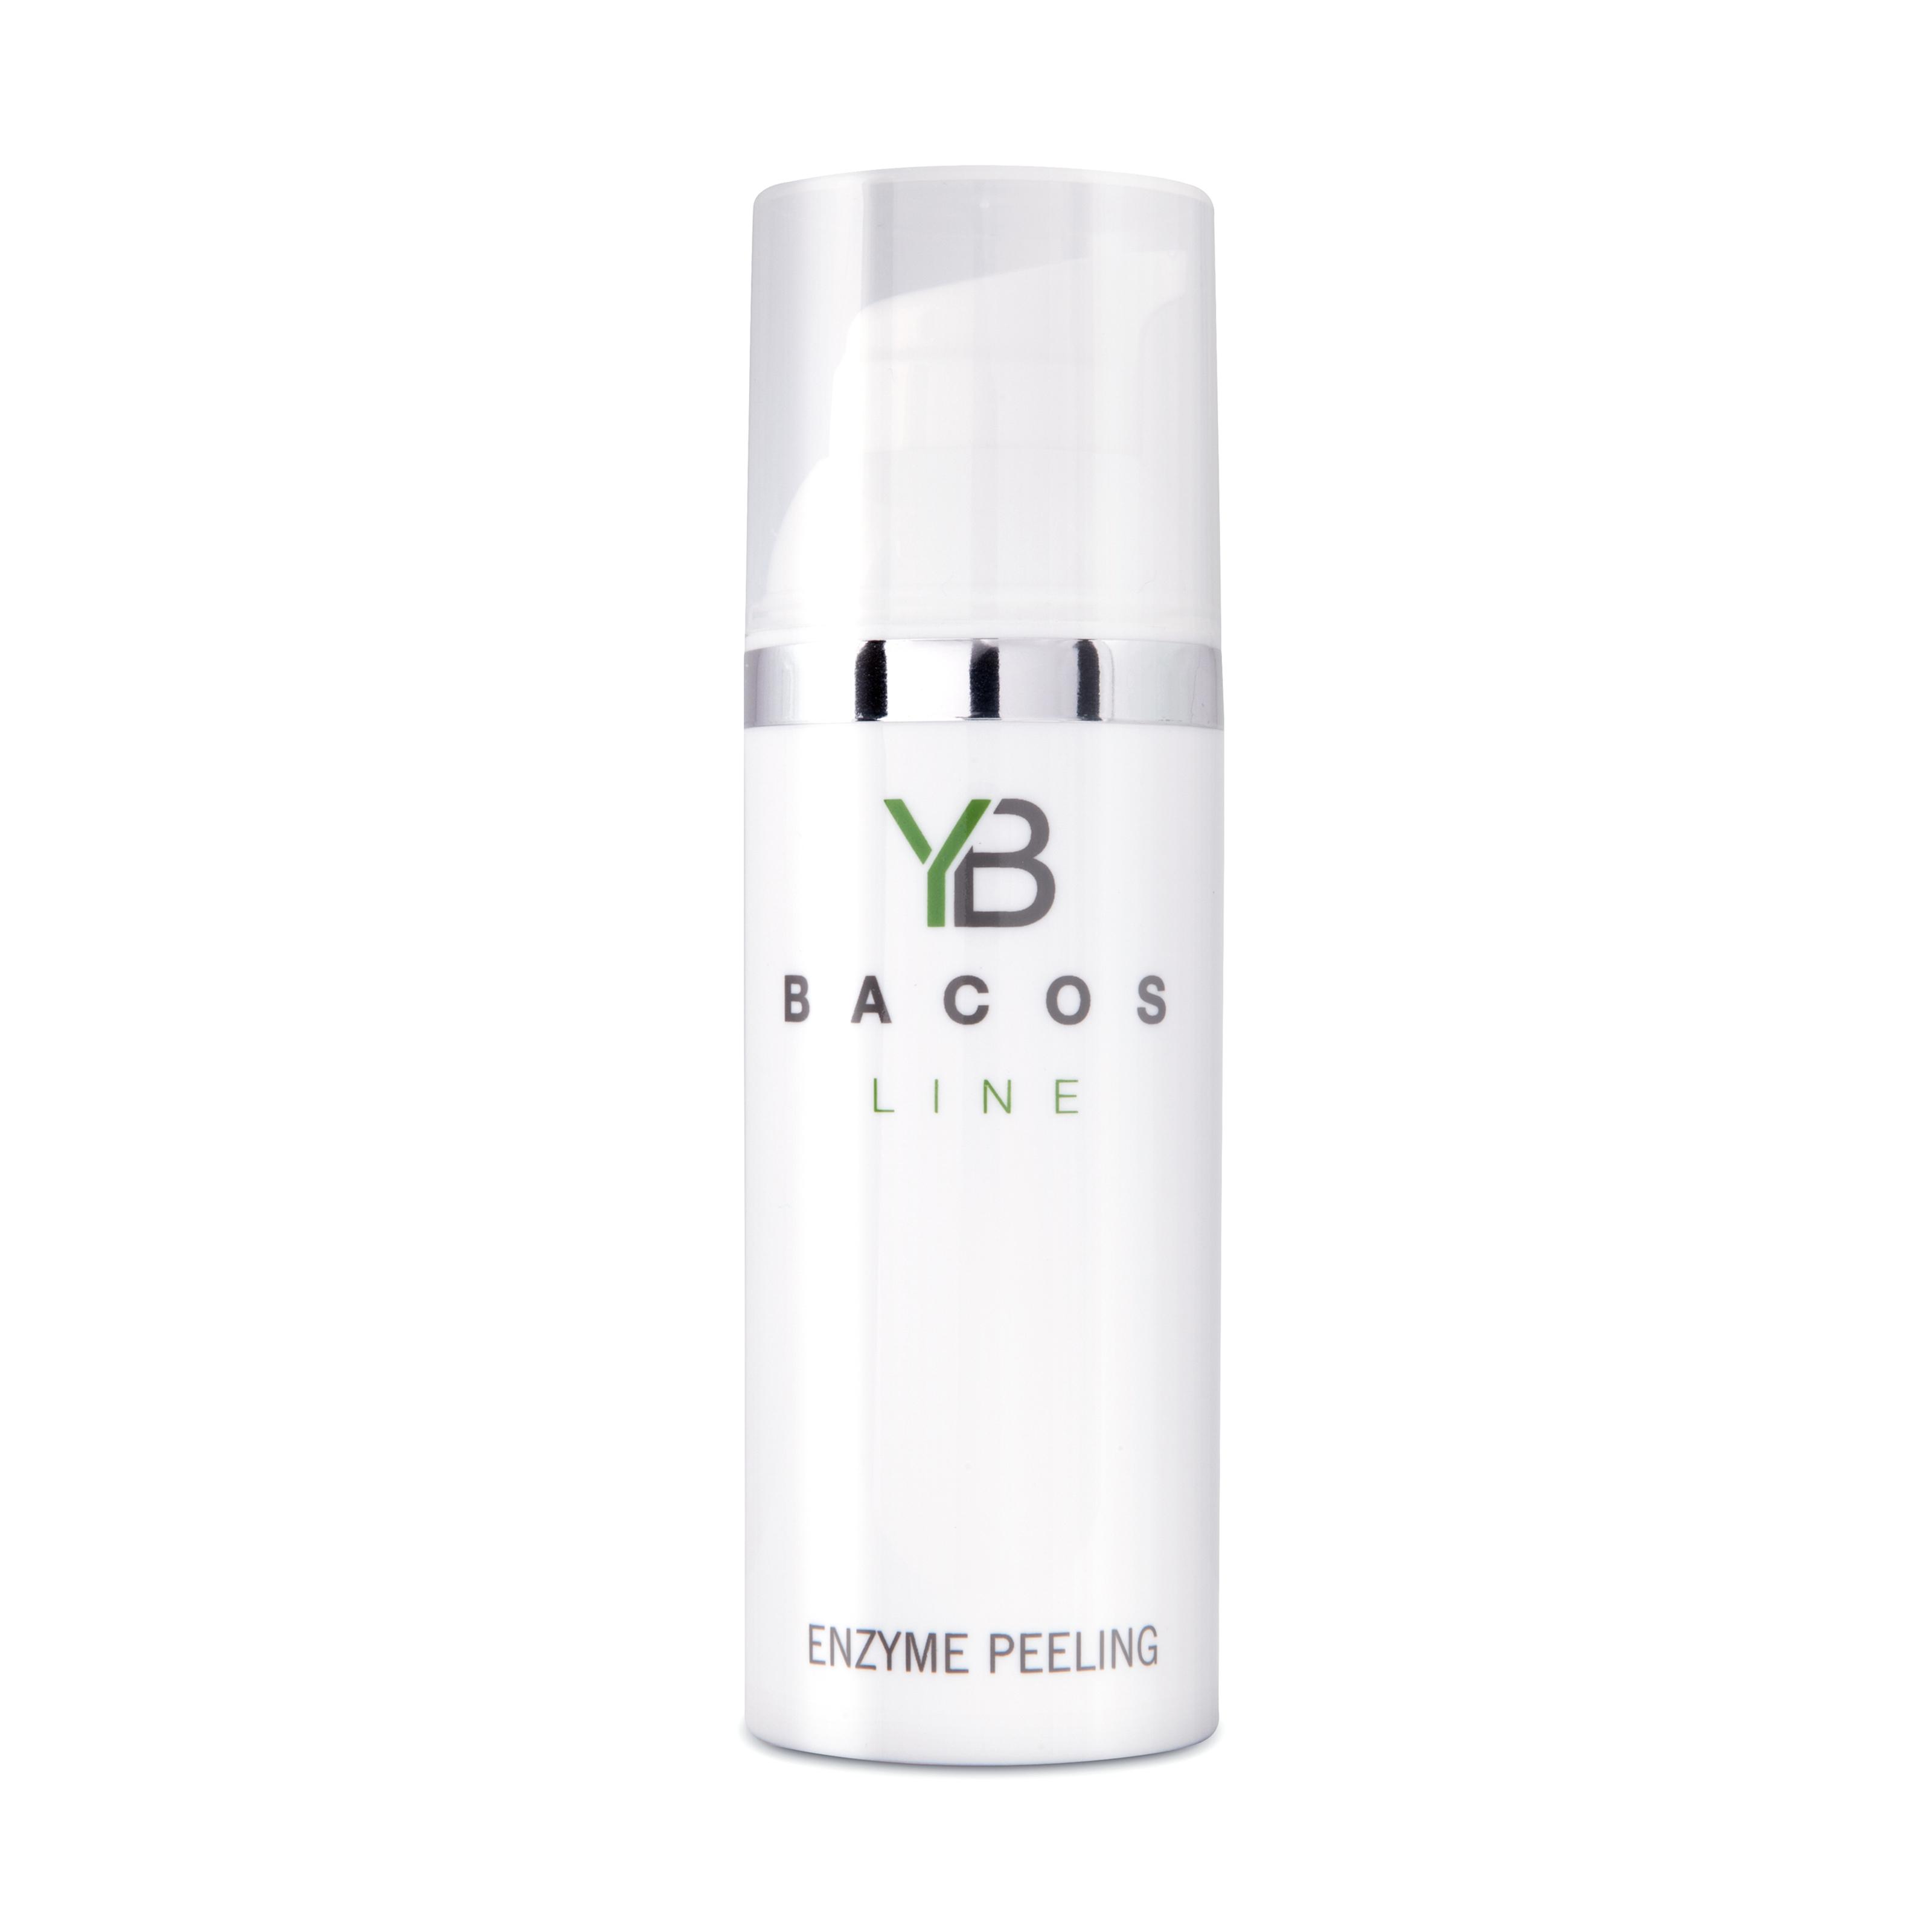 YB BACOS LINE ENZYMPEELING - 50 ml